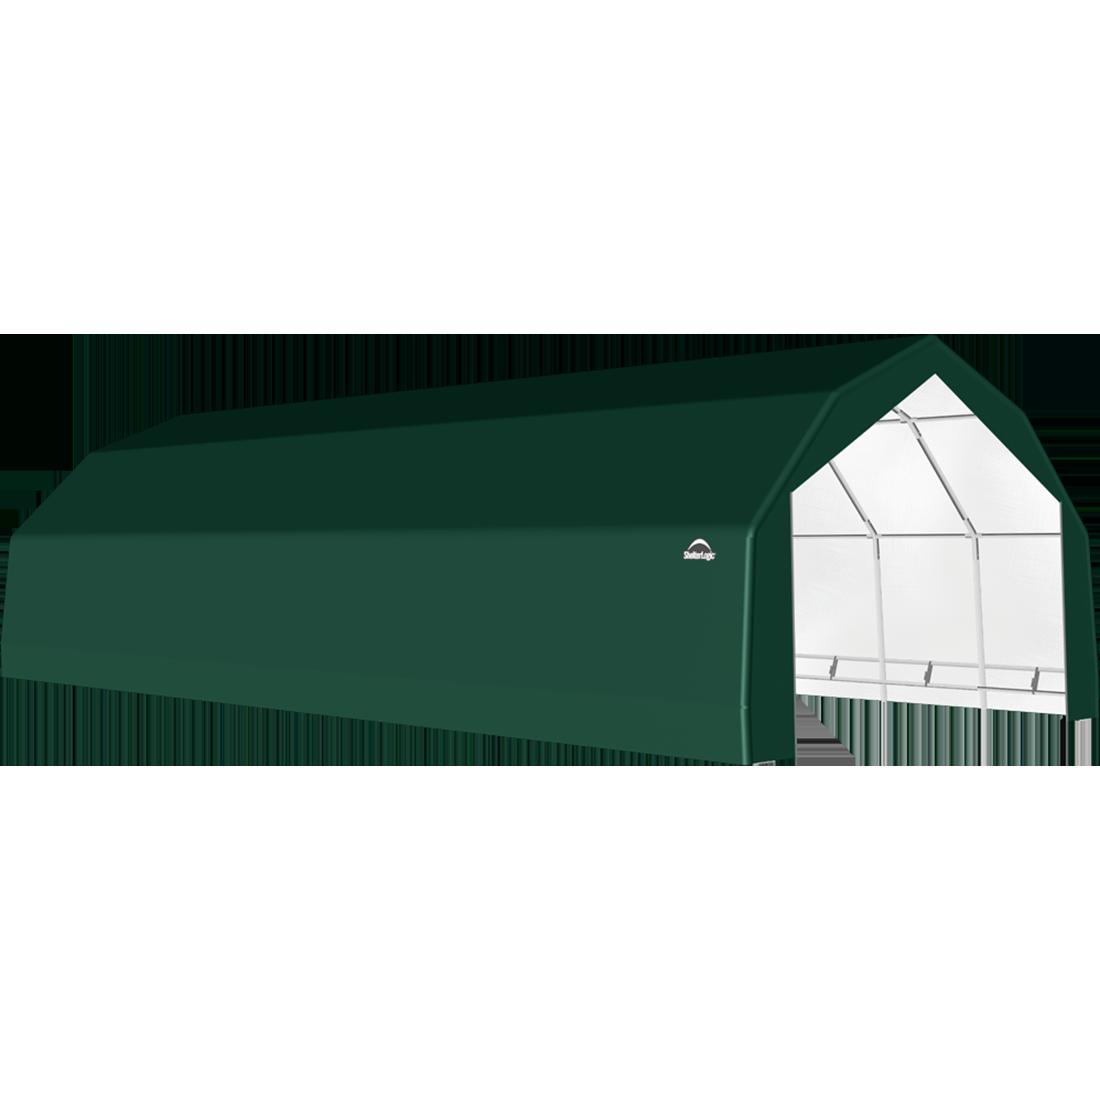 ShelterTech SP Series Barn Shelter, 20 ft. x 32 ft. x 12 ft. Heavy Duty PVC 14.5 oz. Green